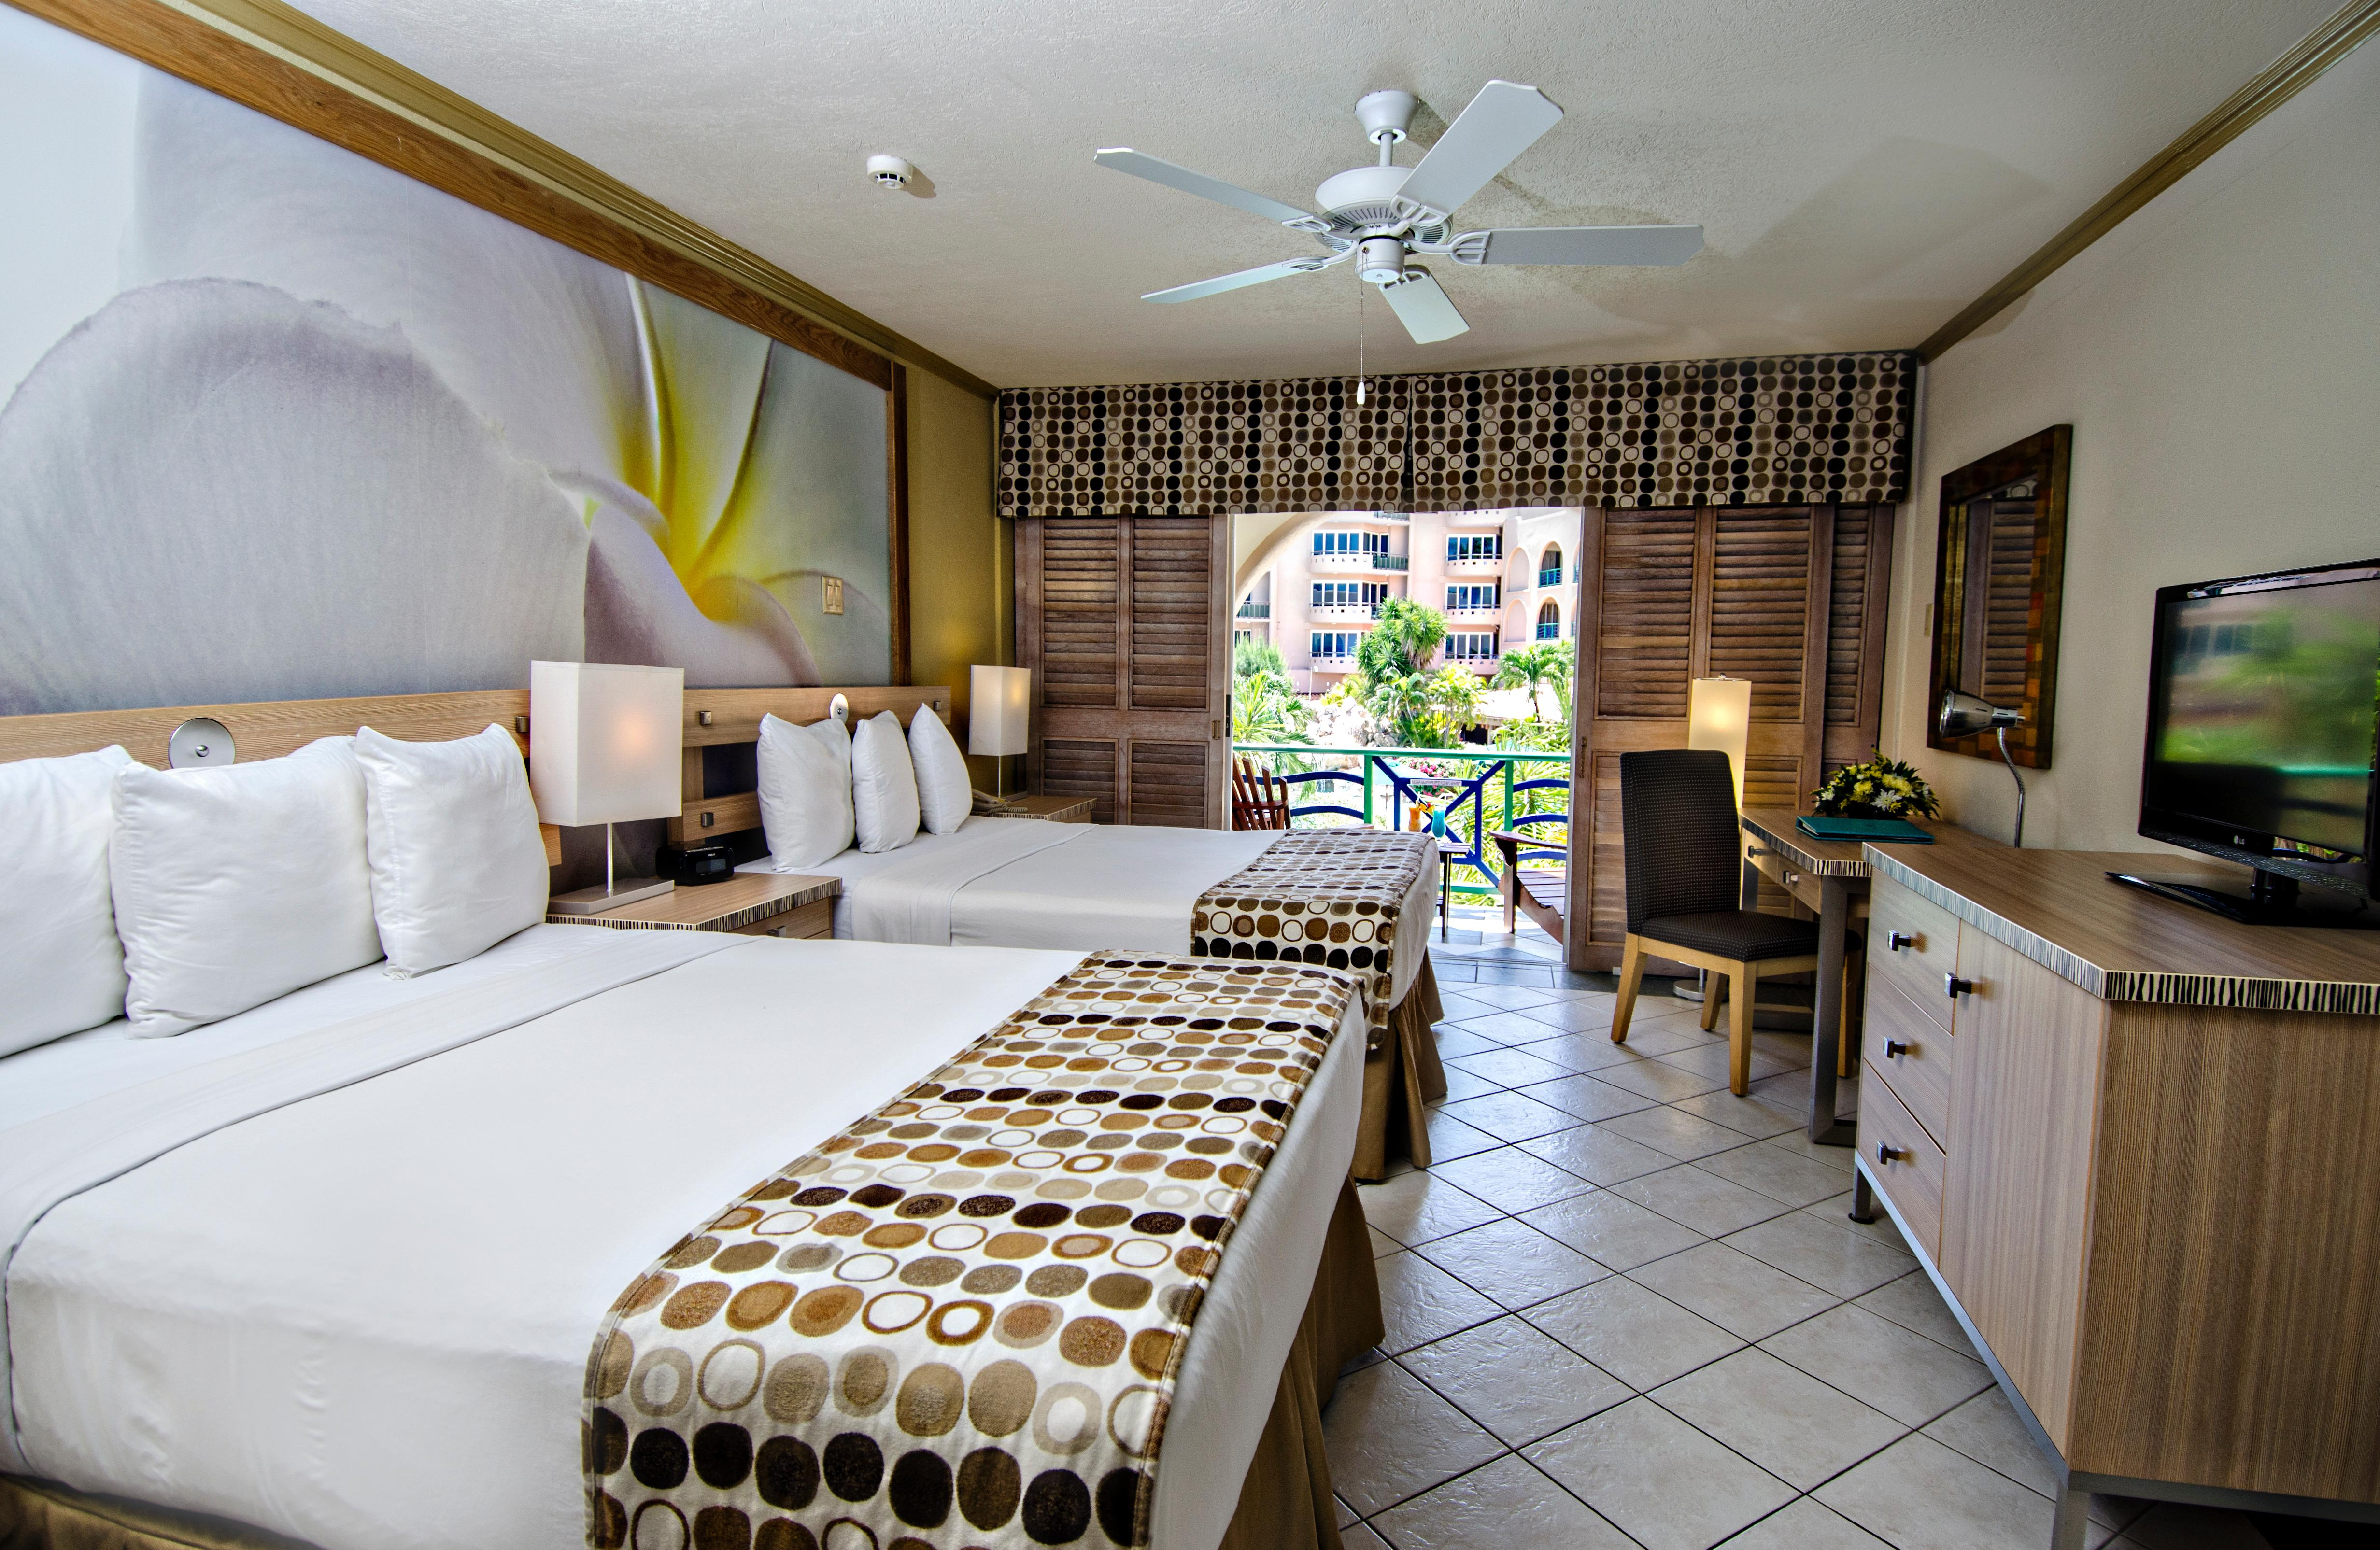 Accra Beach Hotel and Spa en WEST INDIES - BRIDGENTOWN